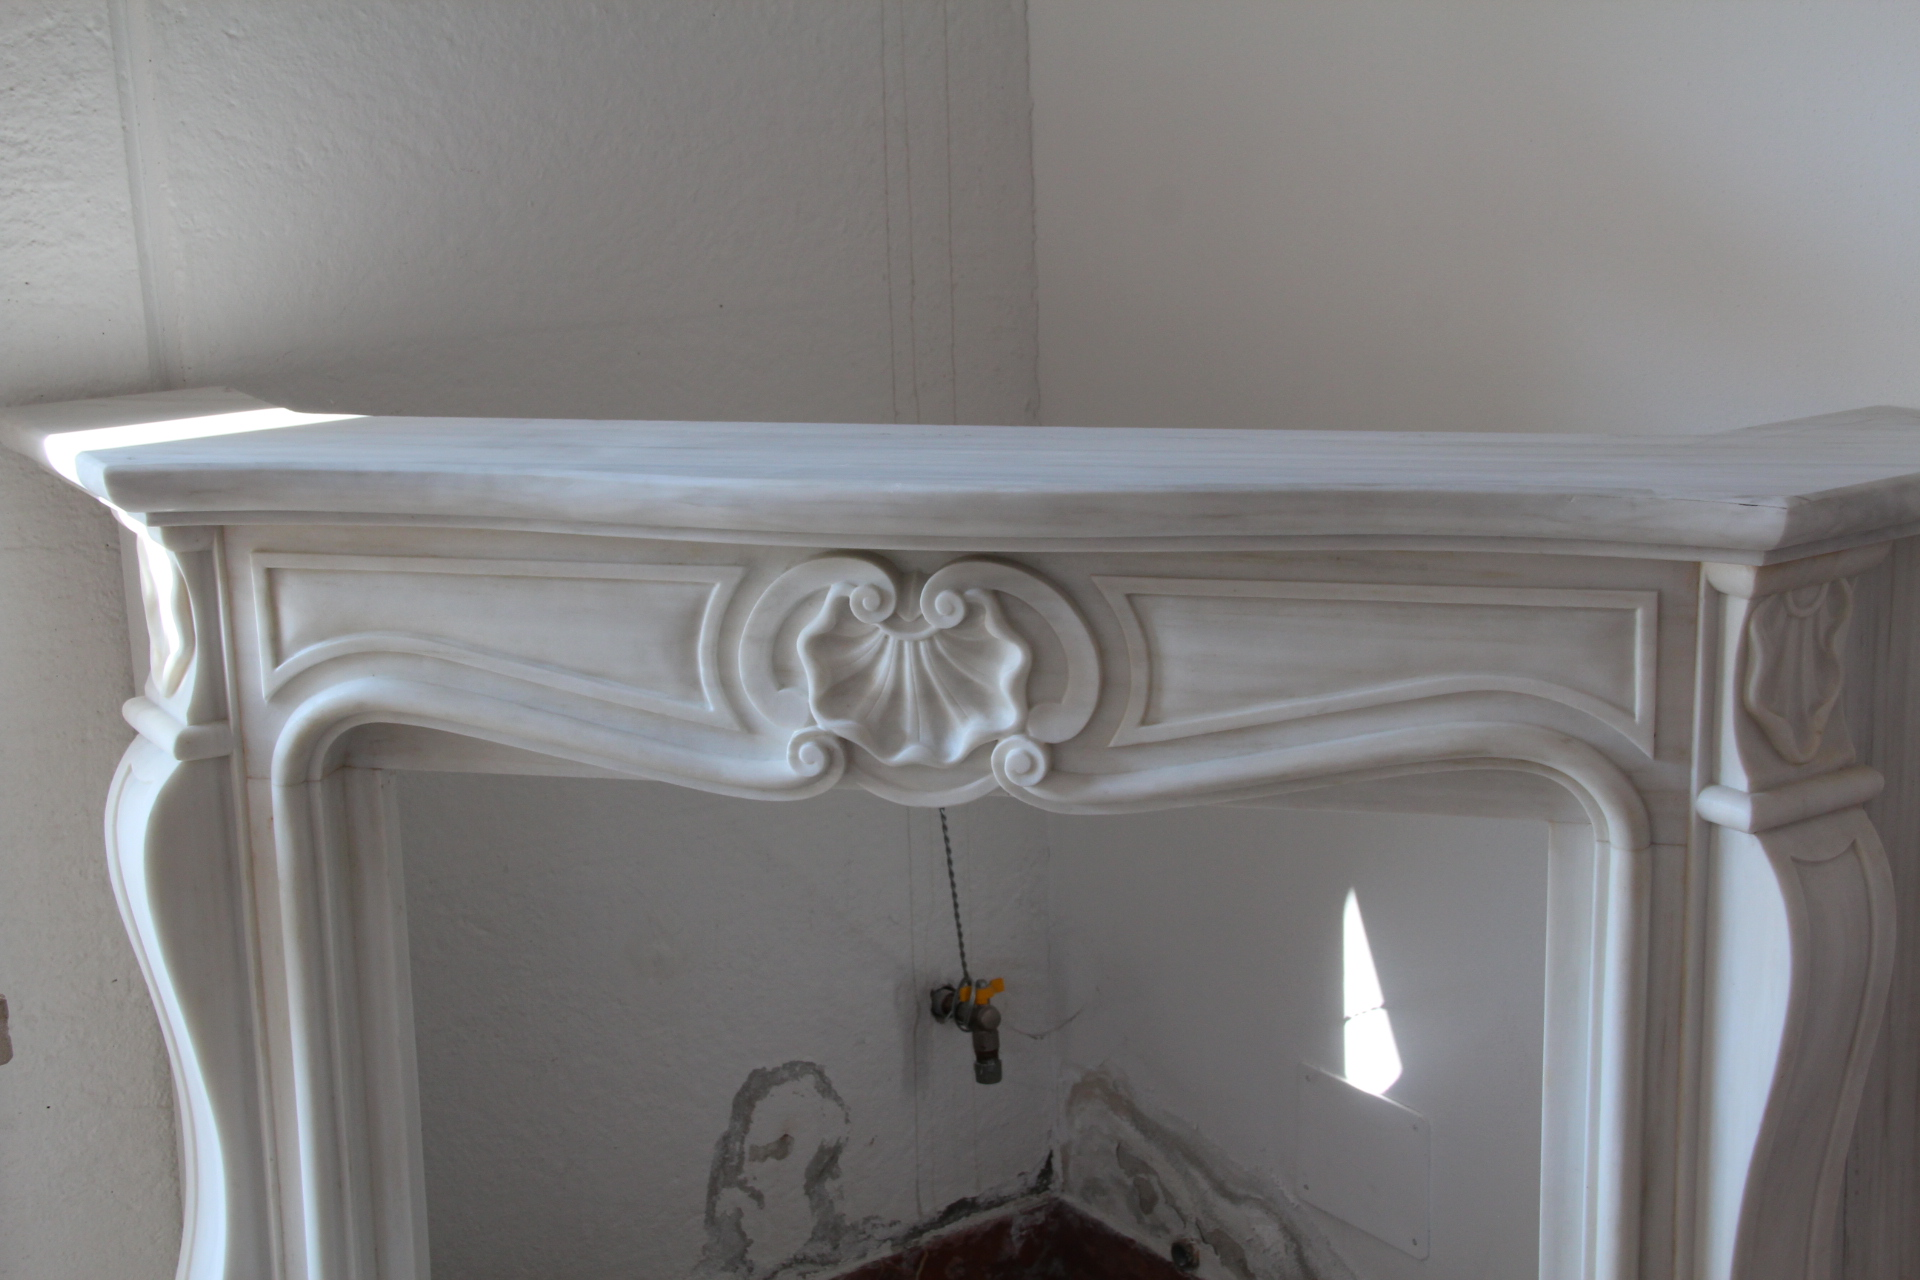 Camino In Marmo Bianco : Camino in marmo bianco statuario venato f al